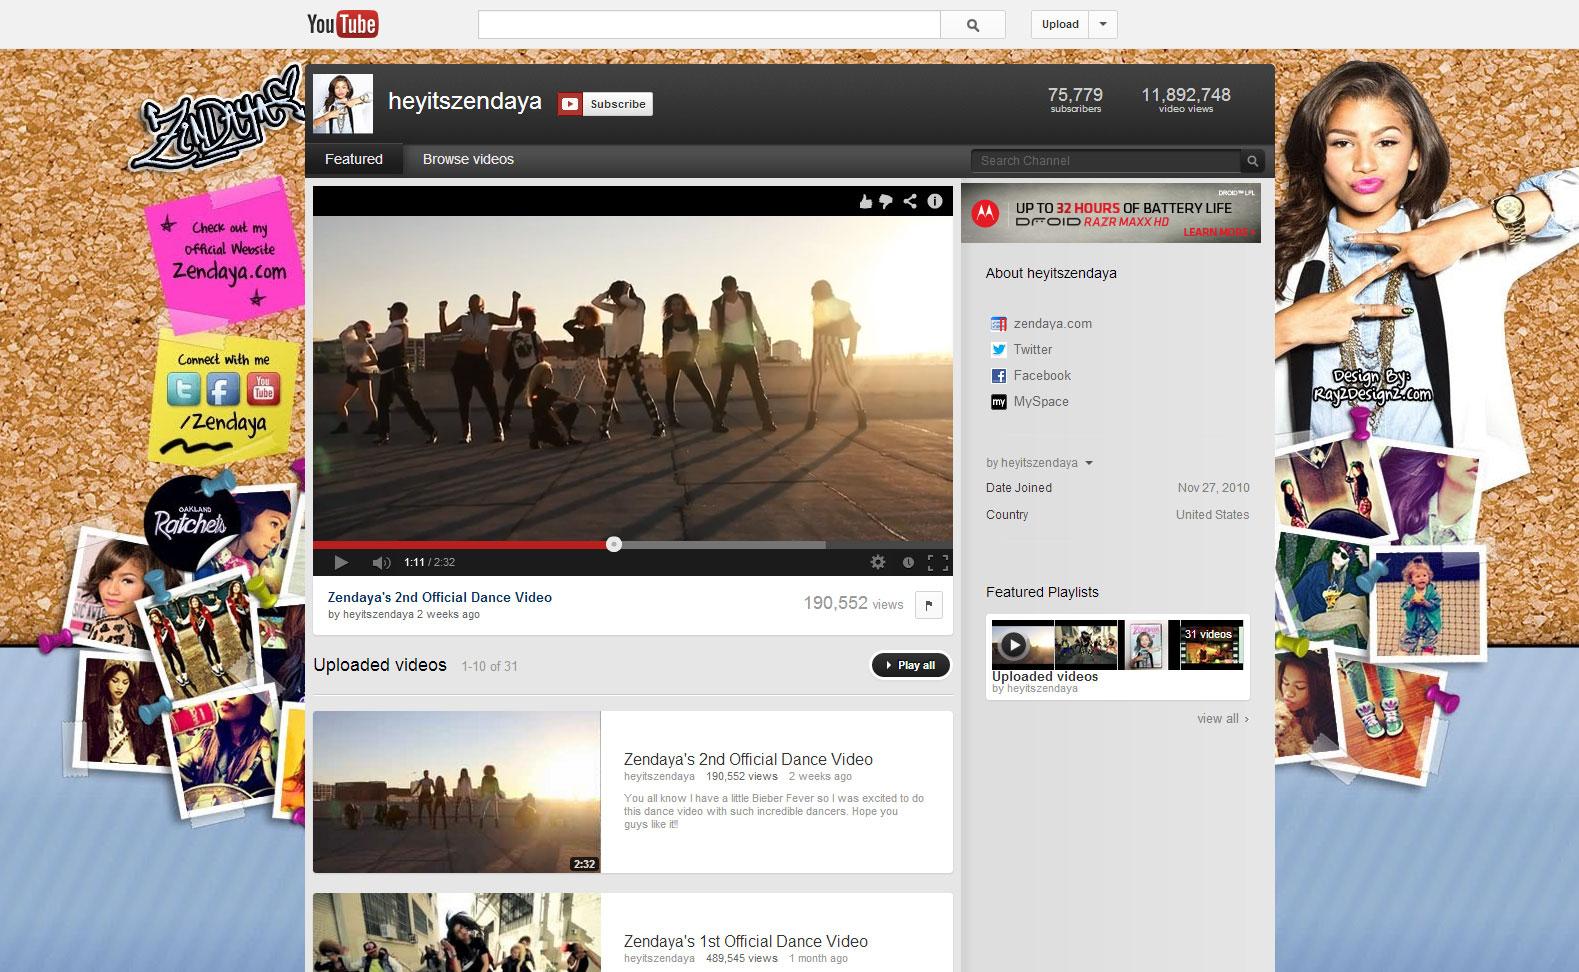 zendaya_rayzdesignz_youtubeCAP